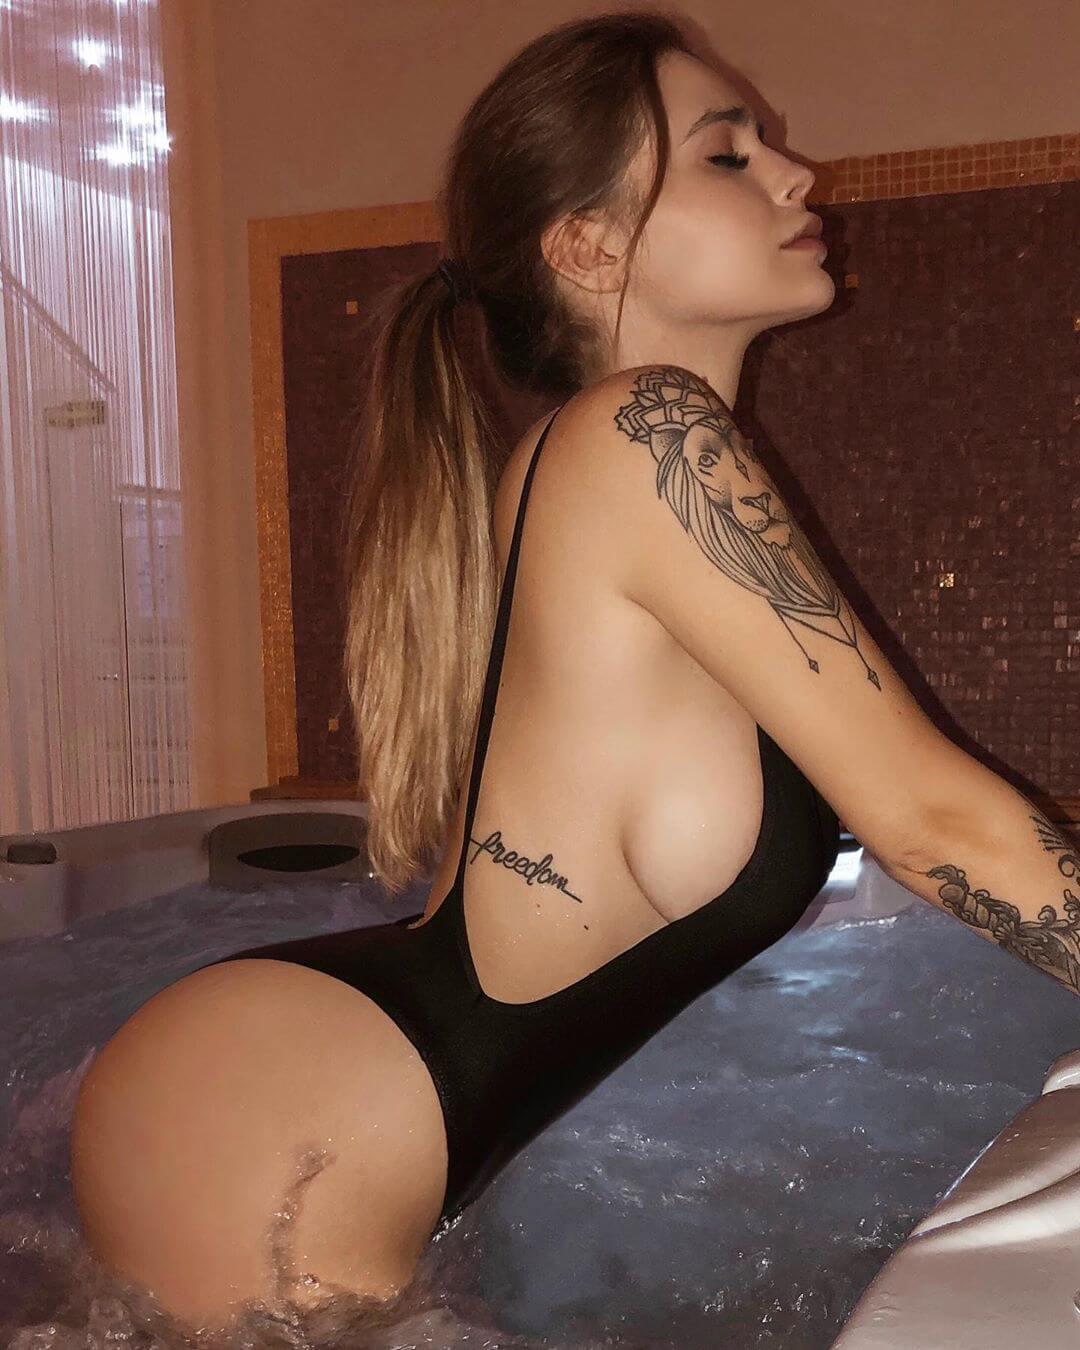 Ginevra Lambruschi sexy cleavage pics